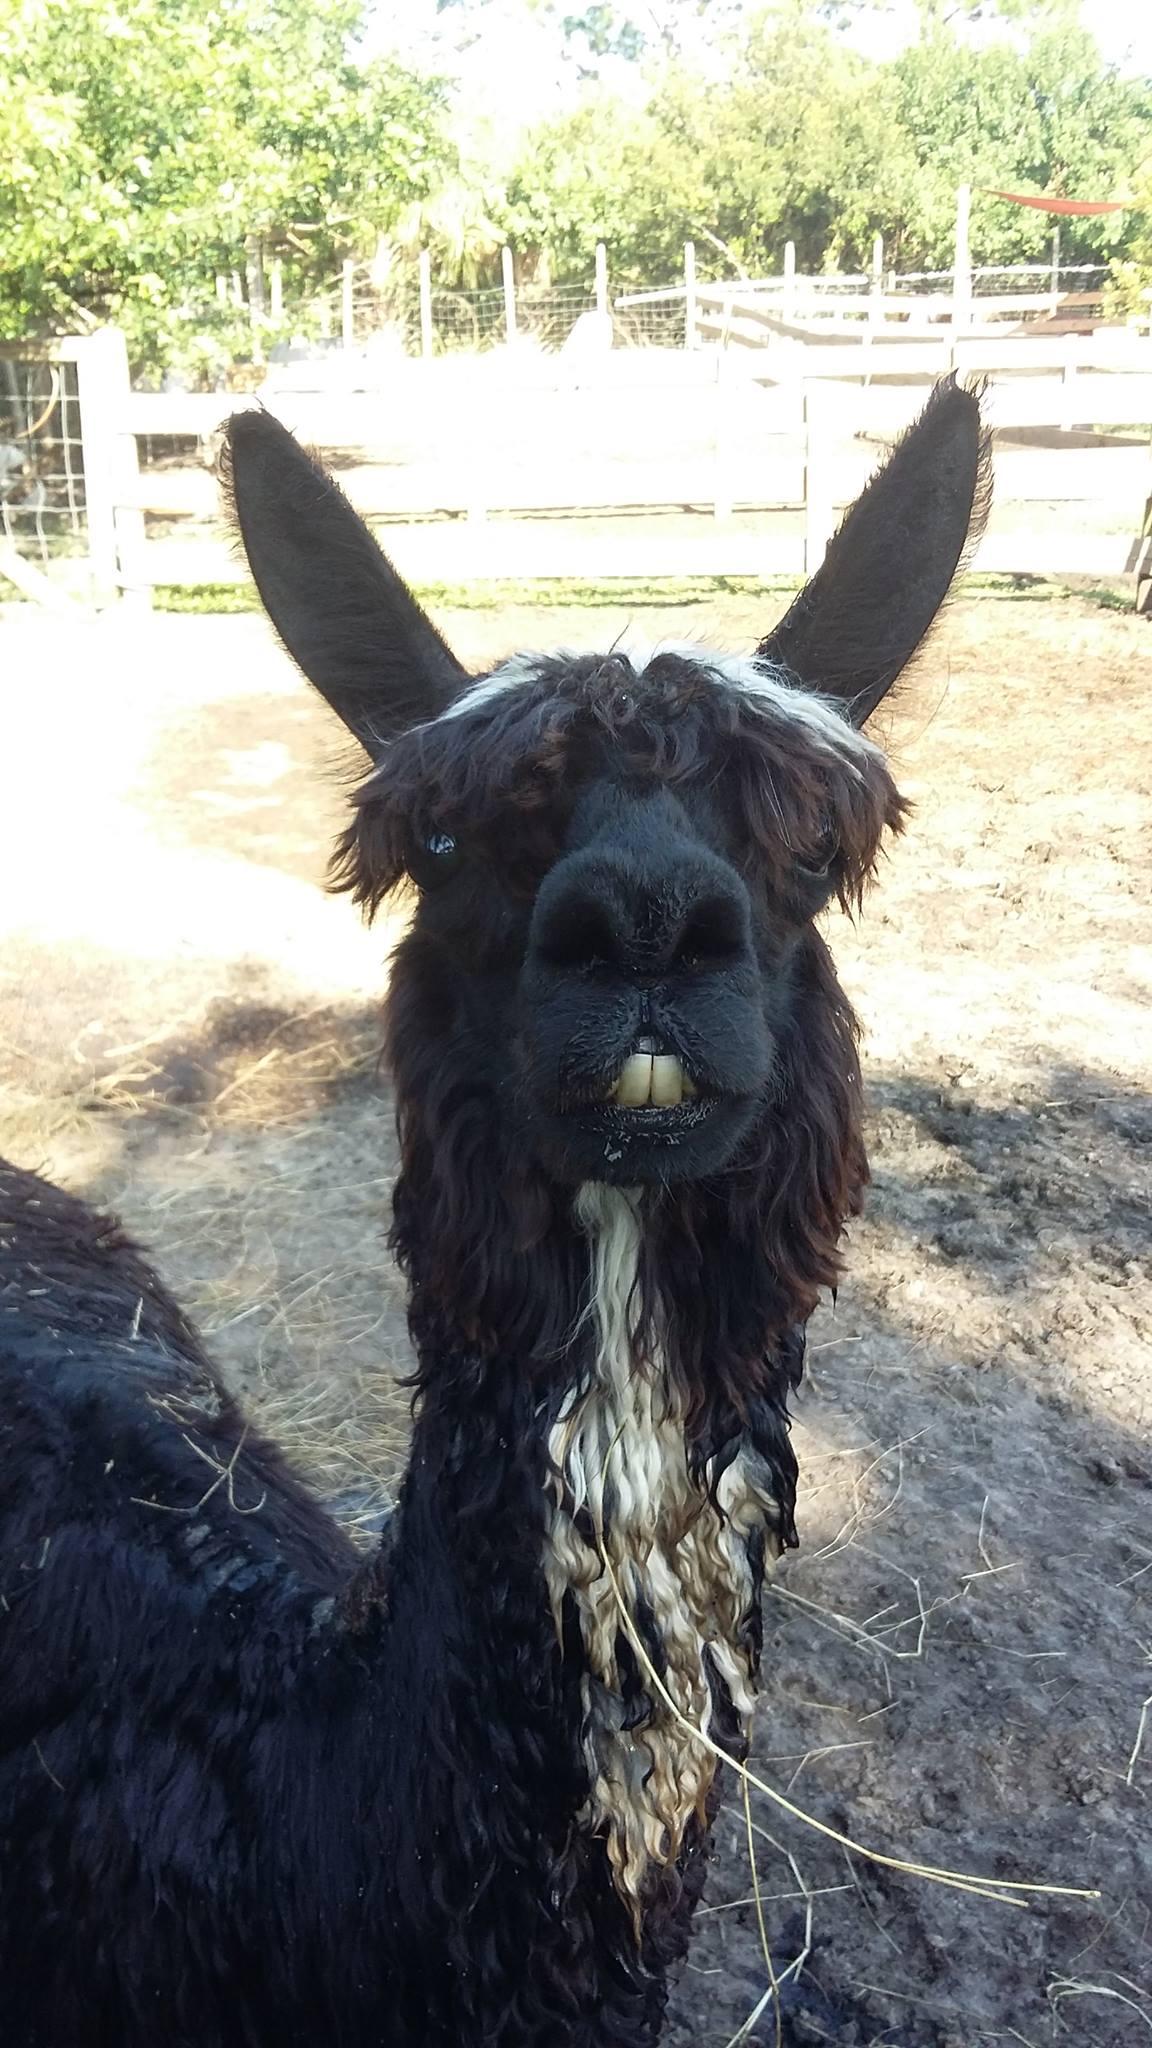 llama-saying-hello-obloy-family-petting-farm.jpg